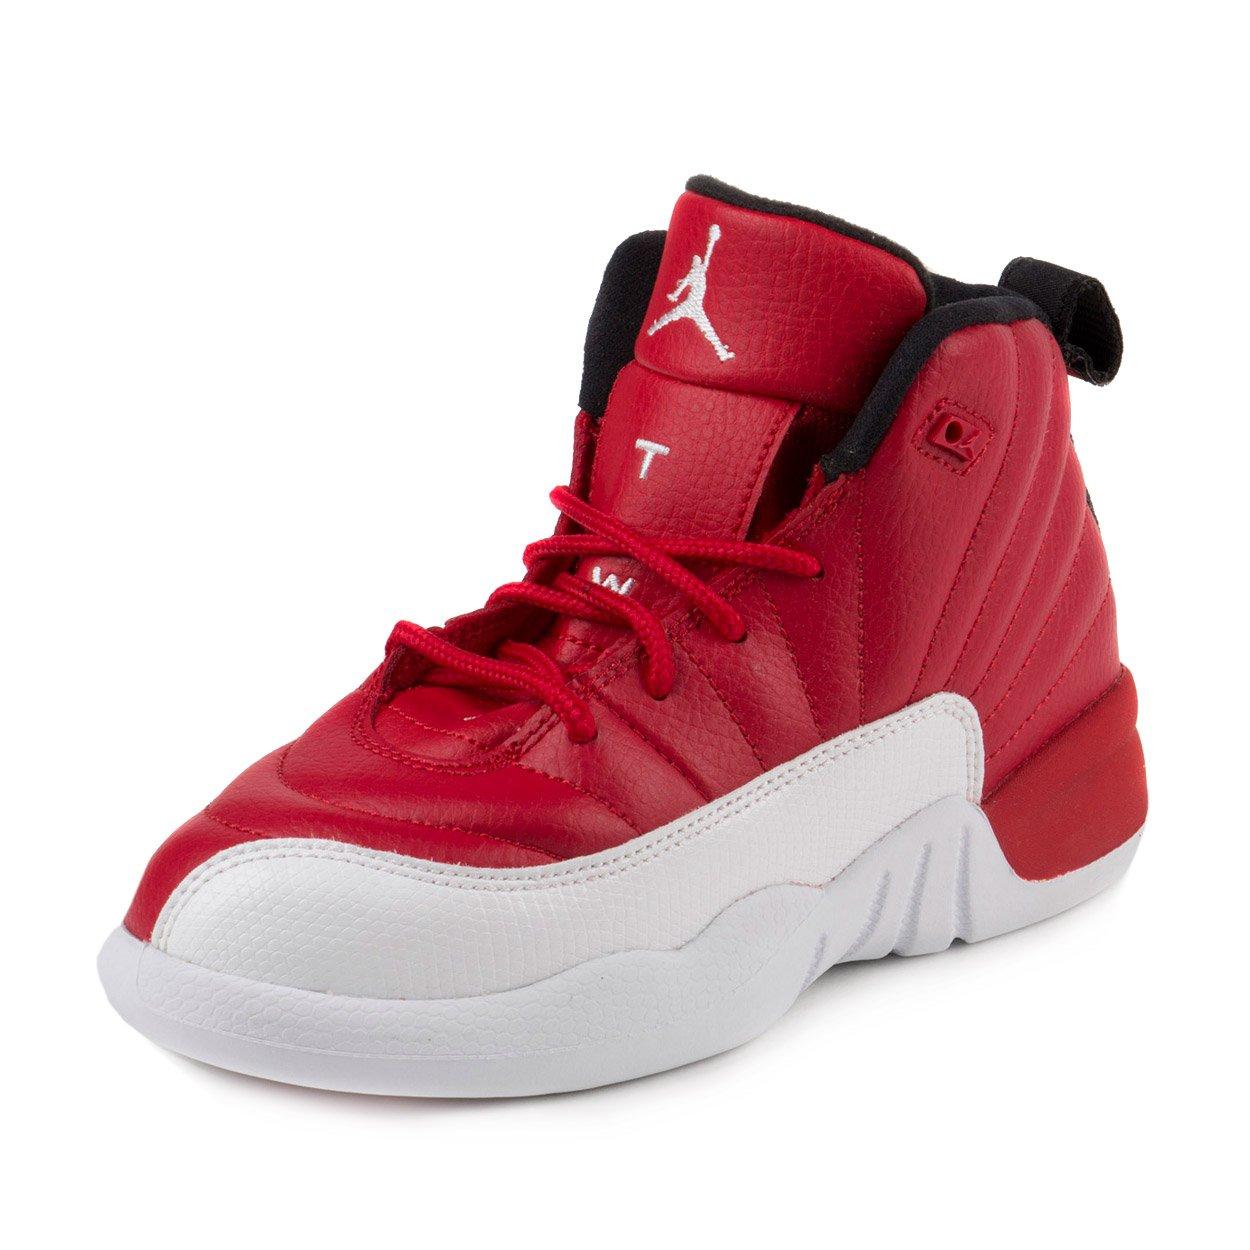 Nike Baby Boys Jordan 12 Retro BP Gym Red/White-Black Suede Size 13C